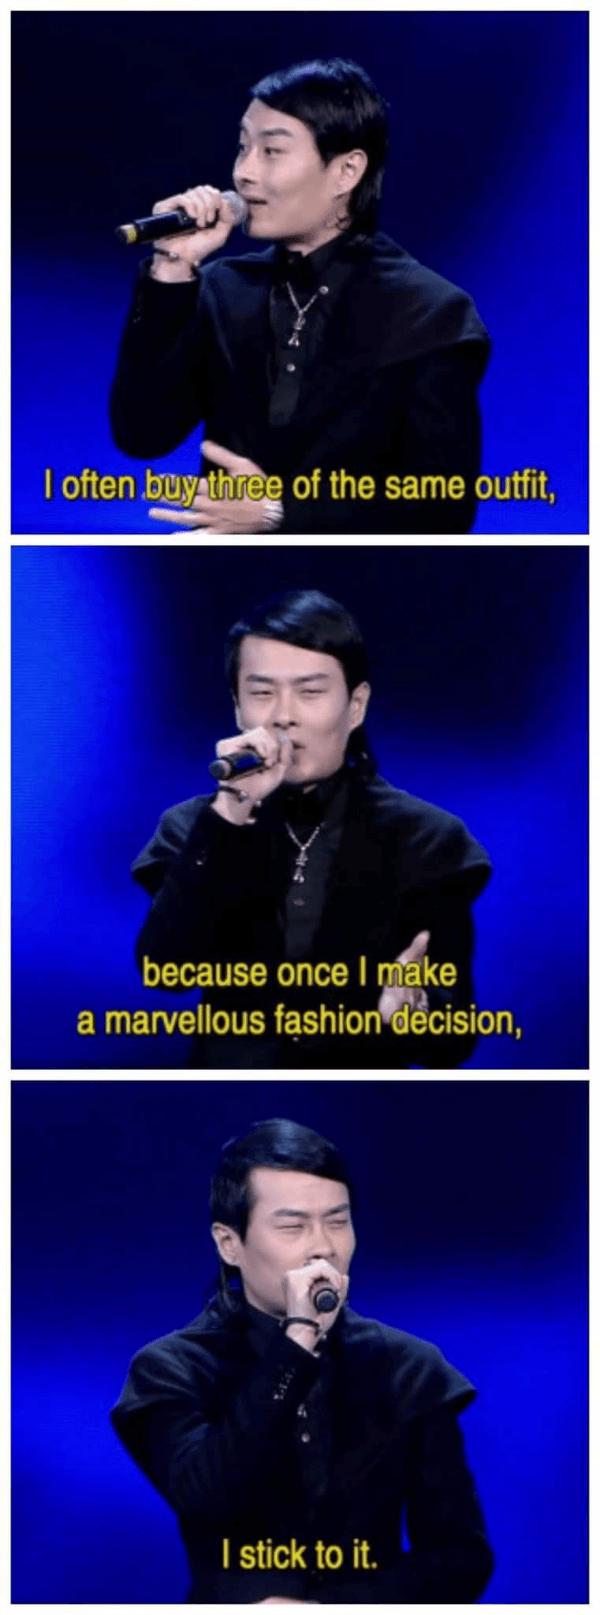 Mervellous Fashion Decision